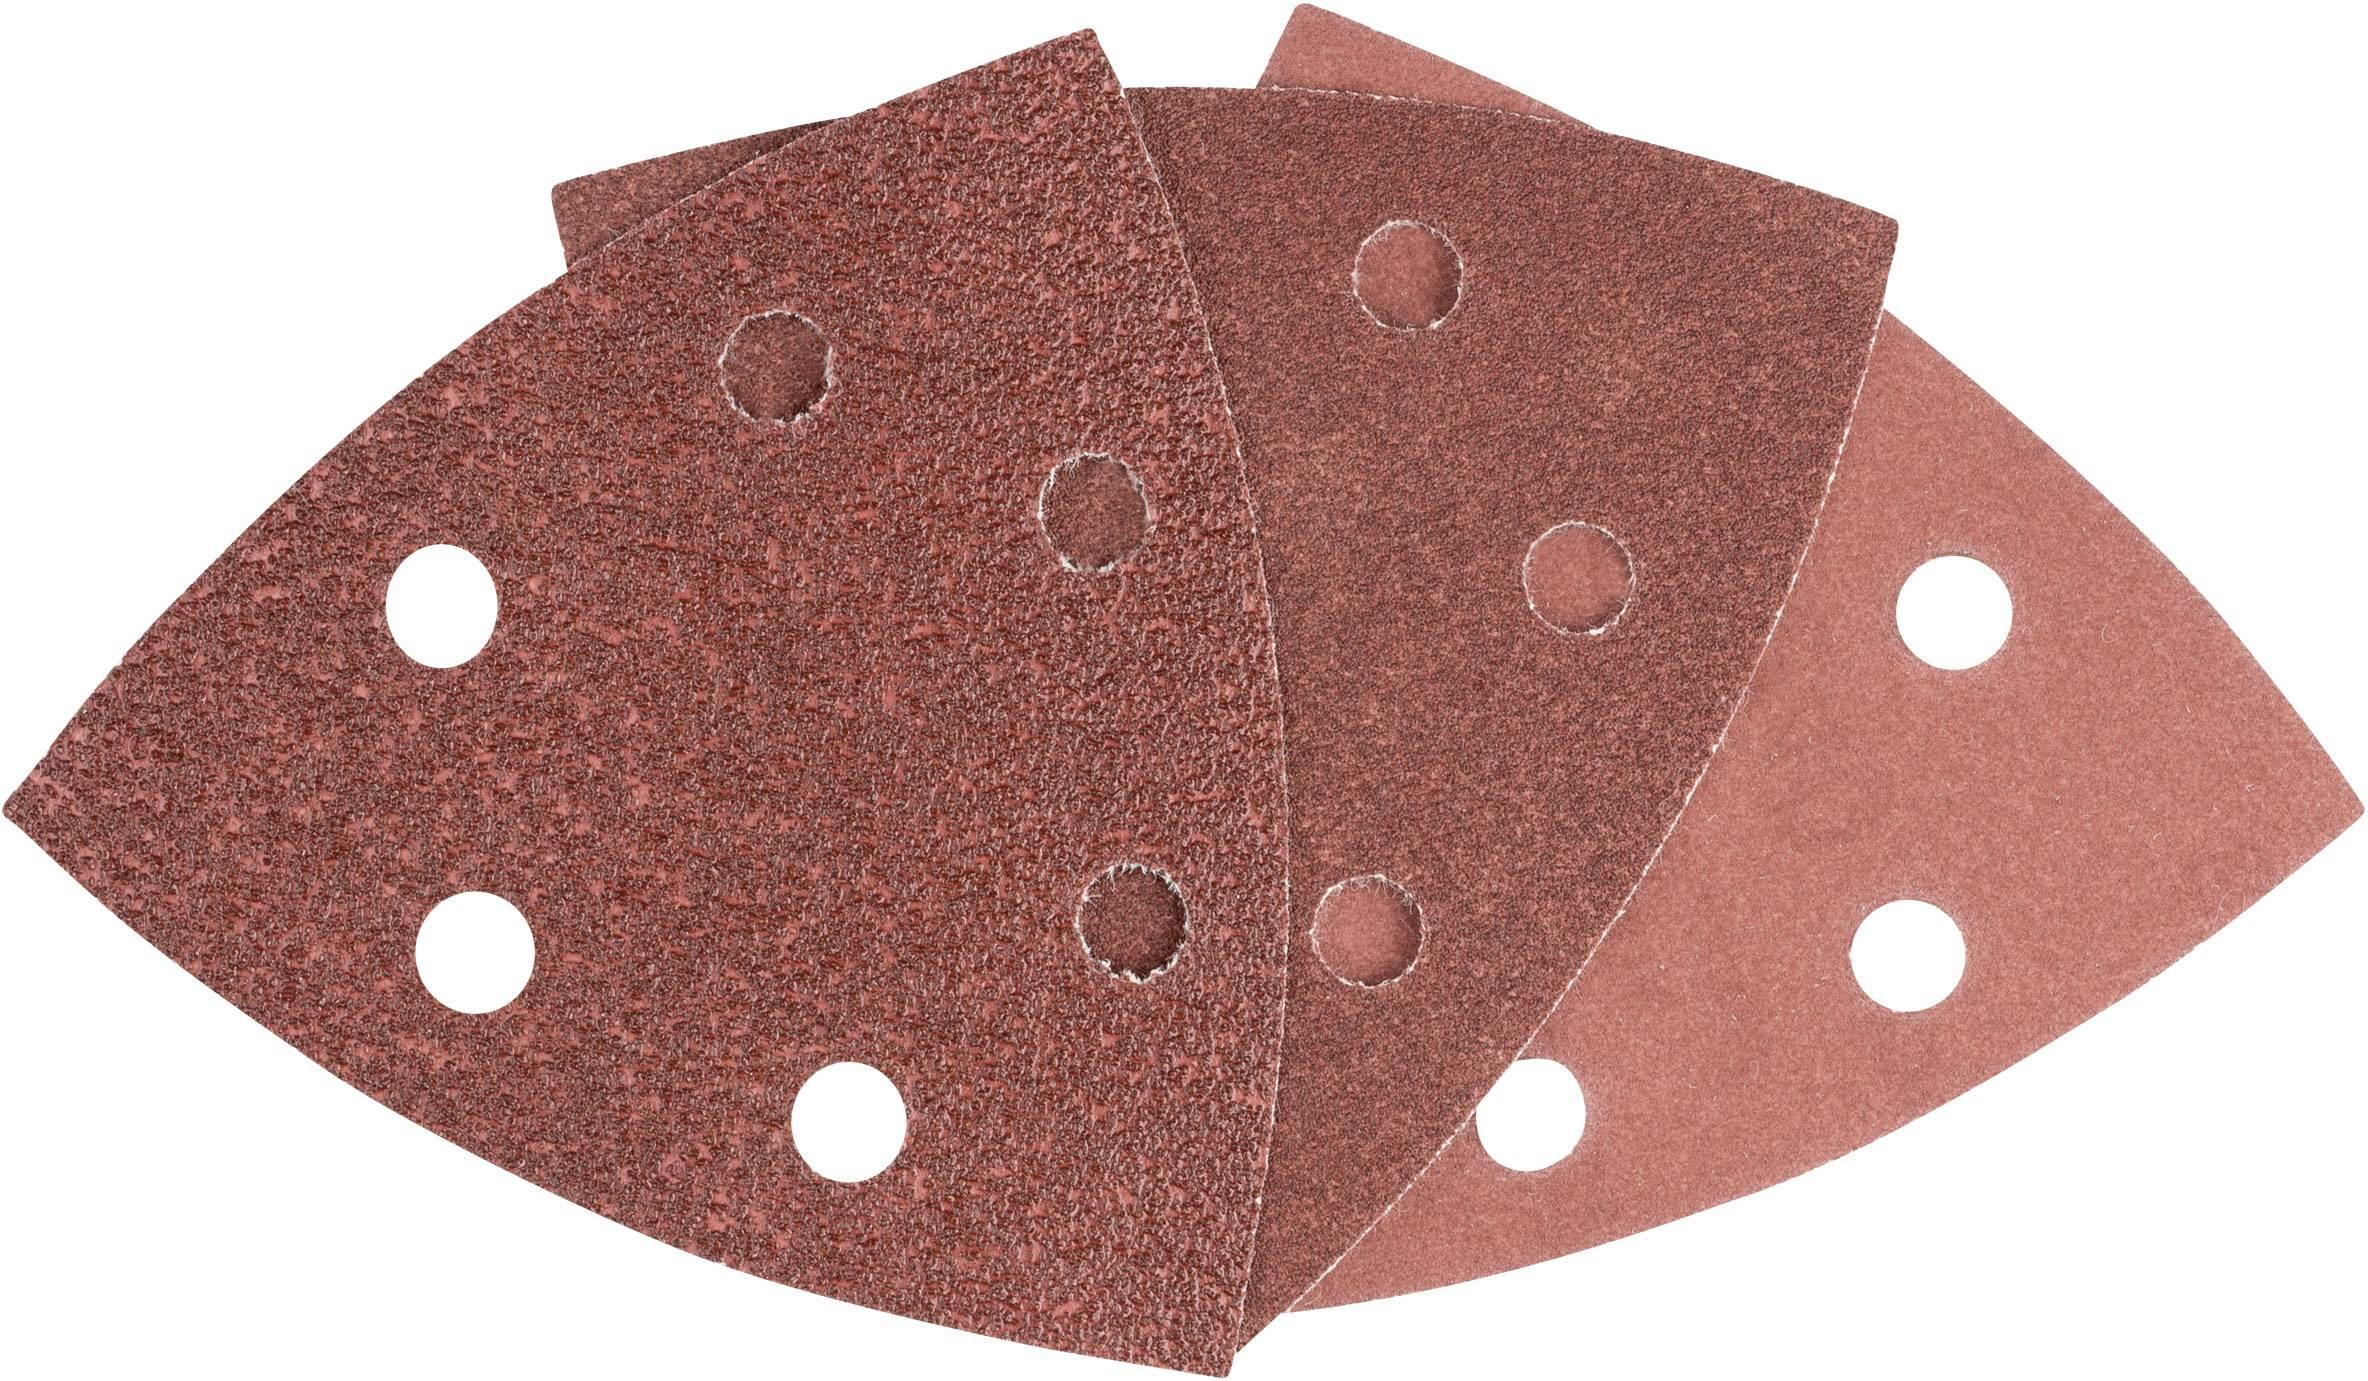 Sada brusných papírů Bosch, 2608605191, 6 ks